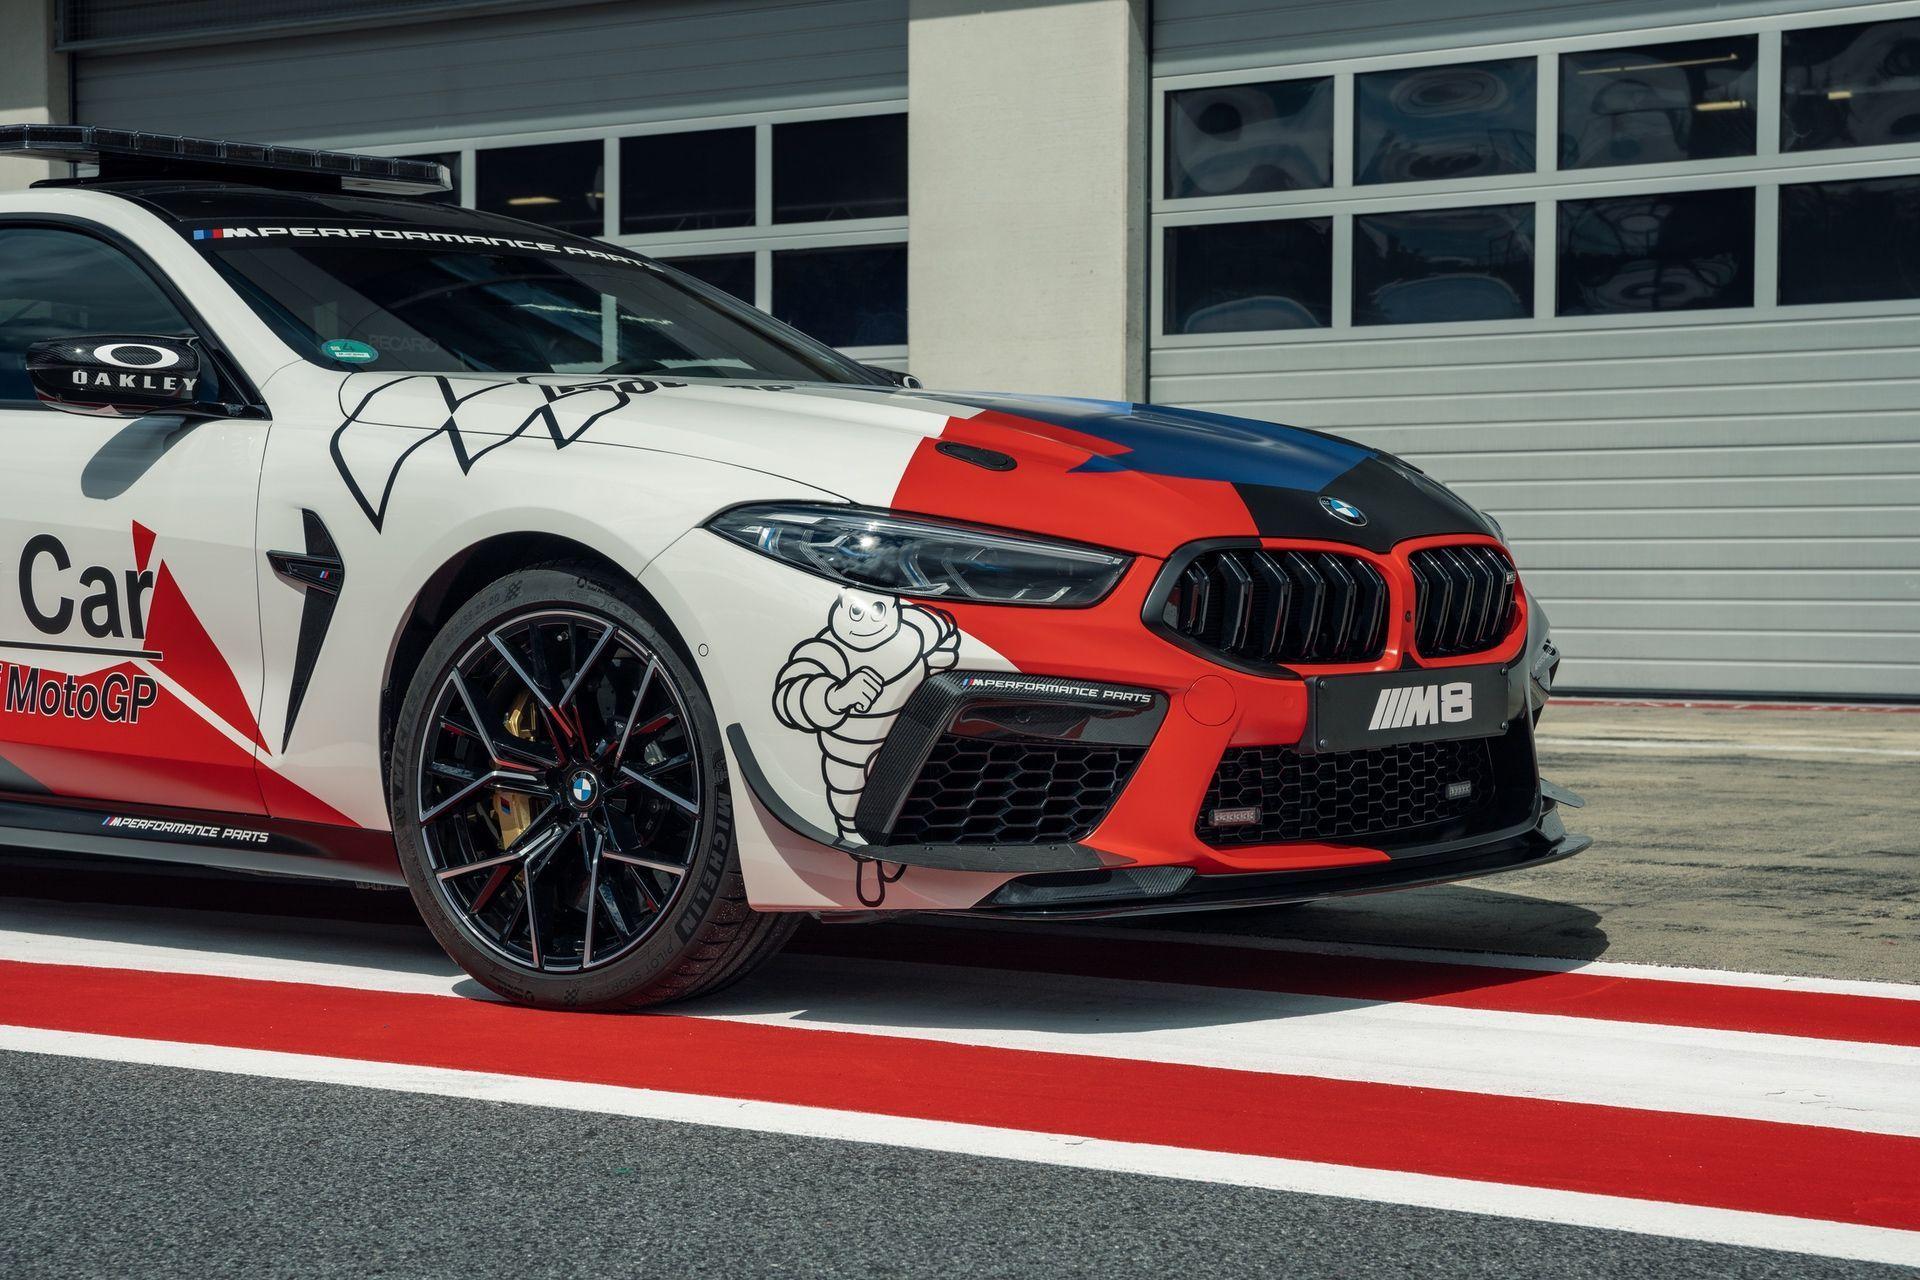 BMW_M8_Gran_Coupe_Safety_Car_MotoGP_0009